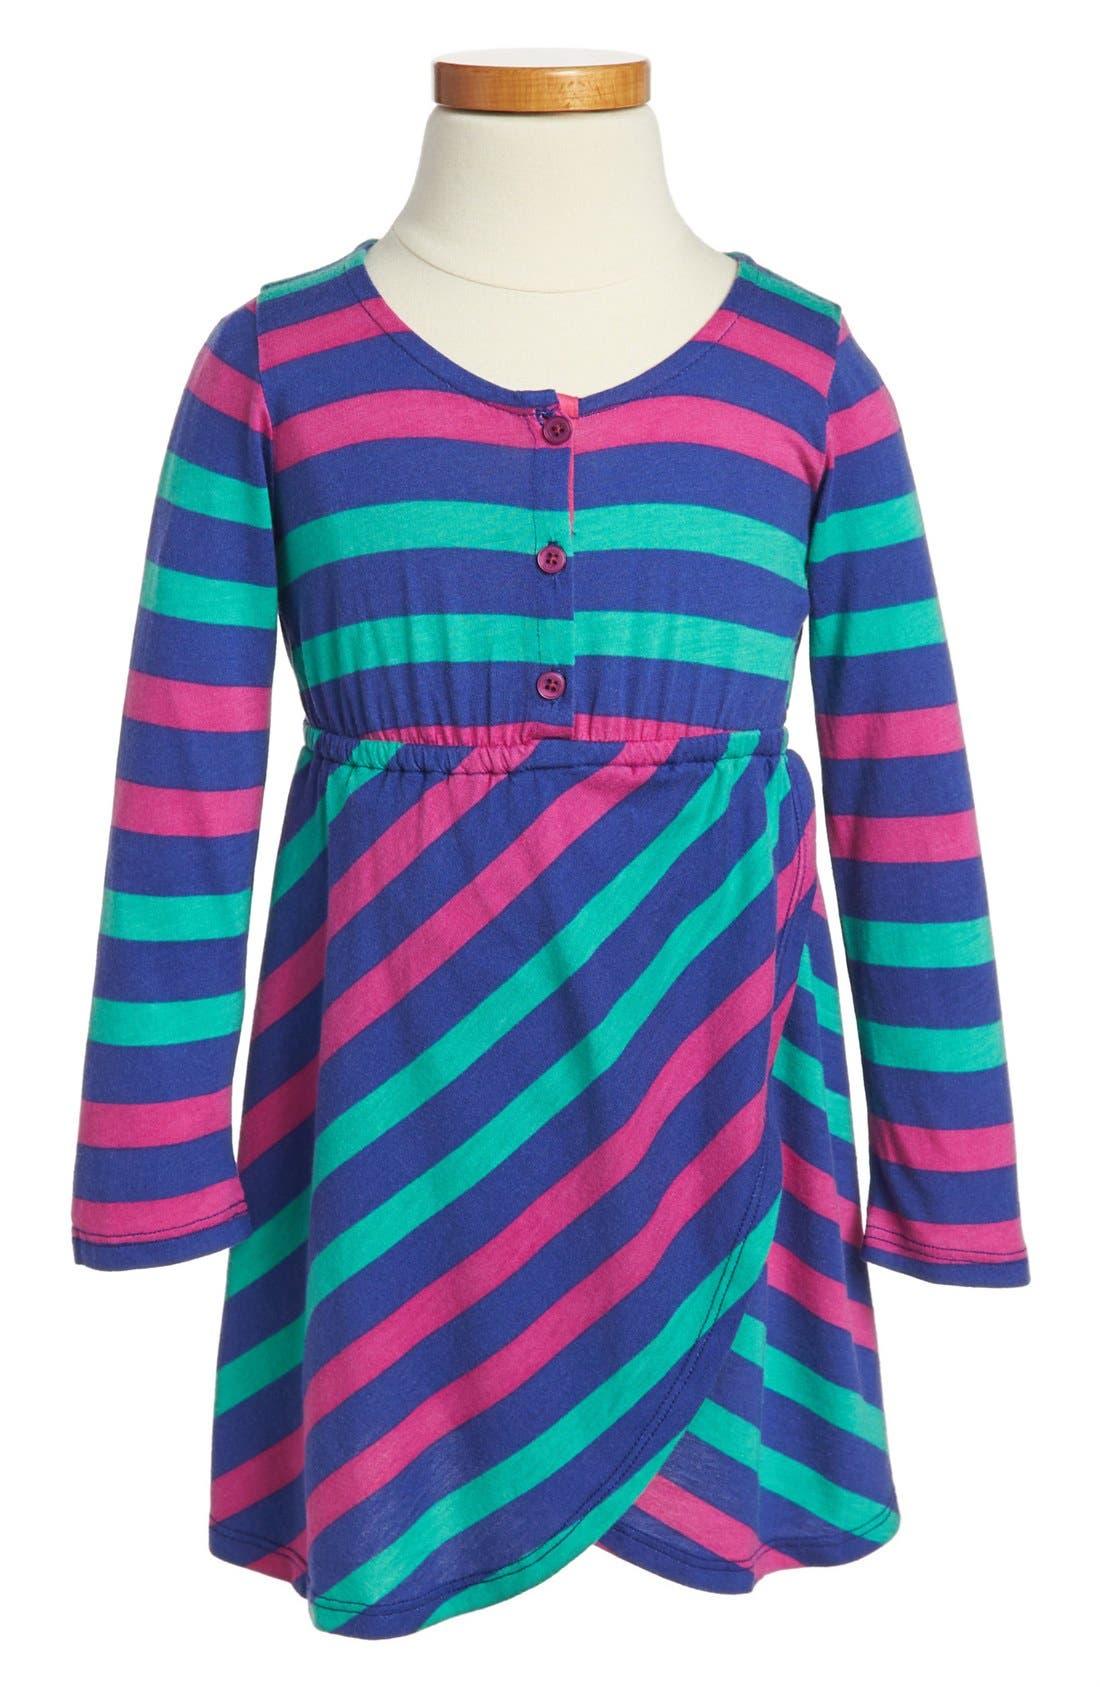 Alternate Image 1 Selected - Splendid Rugby Stripe Dress (Toddler Girls)